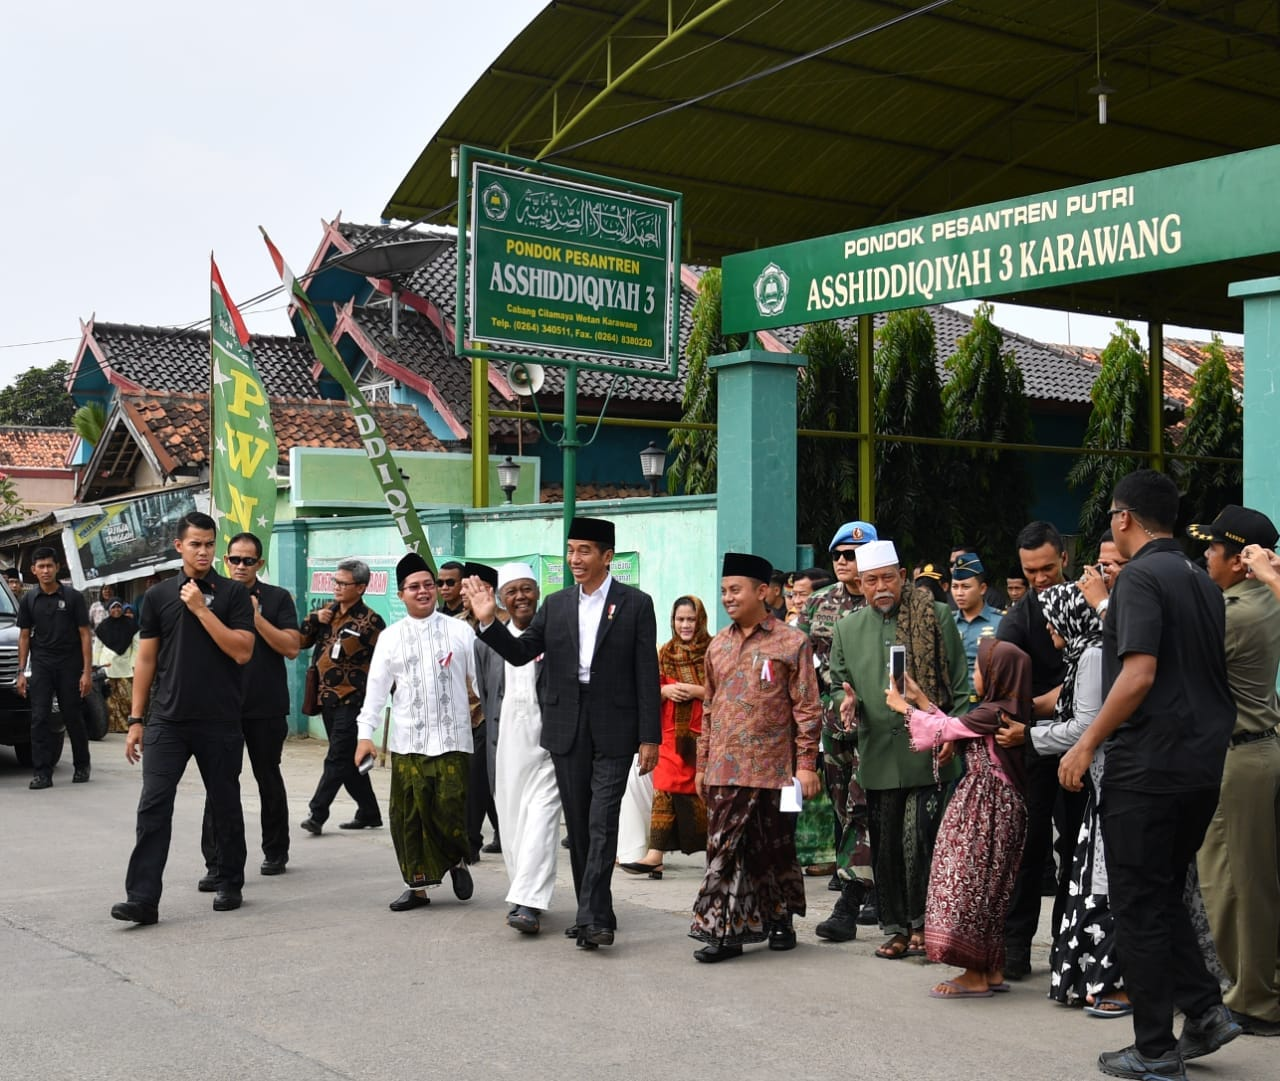 presiden-silaturahmi-dengan-ulama-dan-tokoh-masyarakat-se-karawang-5